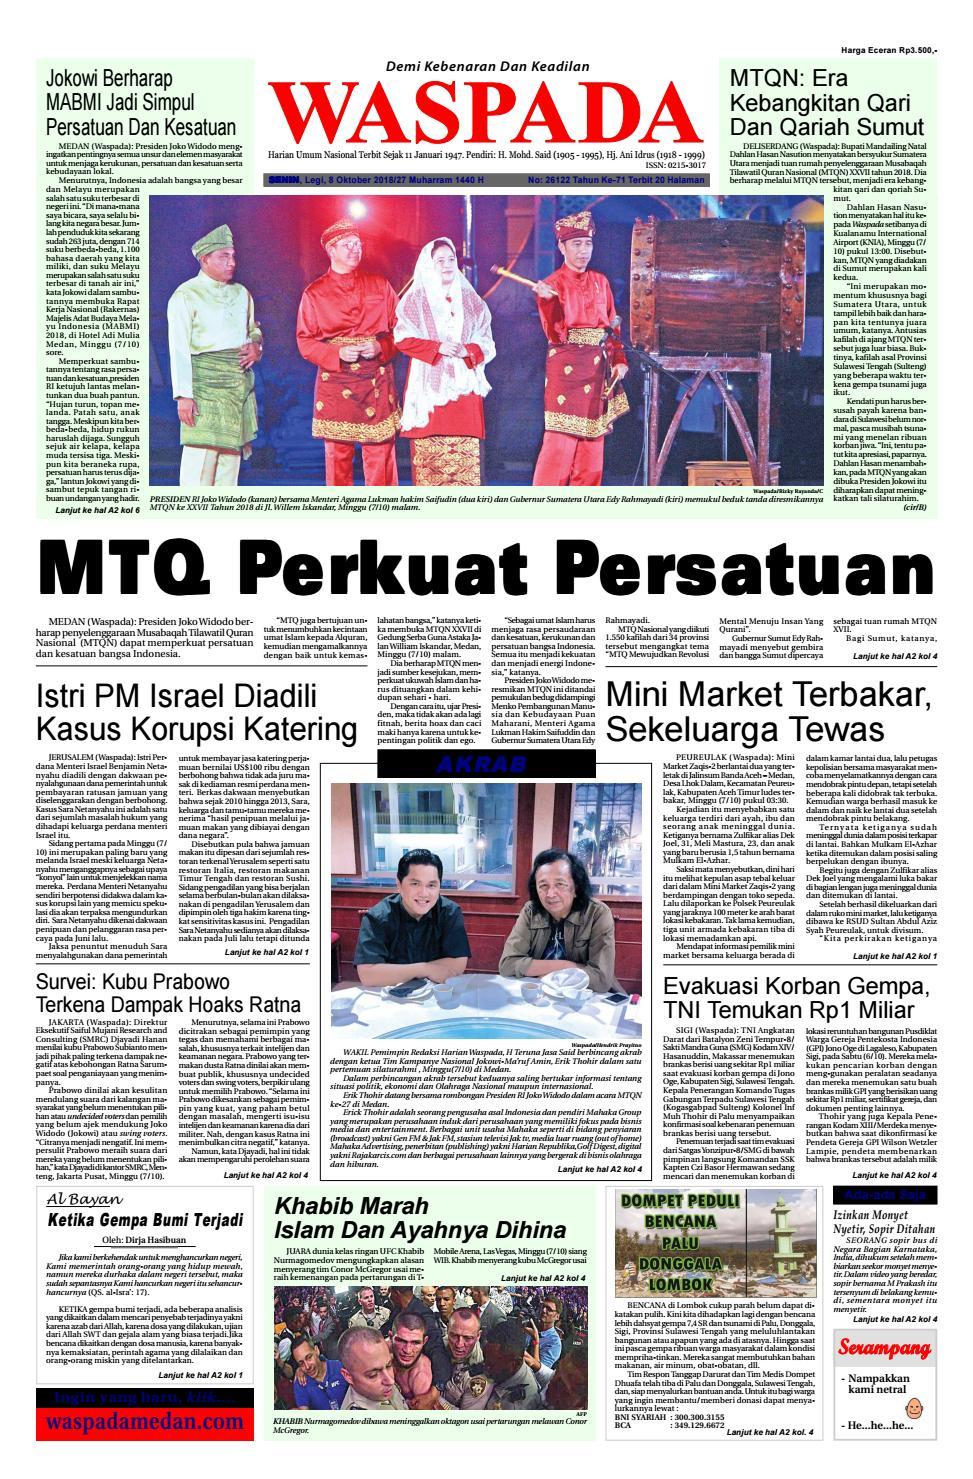 Waspada Senin 8 Oktober 2018 By Harian Issuu Produk Ukm Bumn Suscho Sus Coklat Surabaya